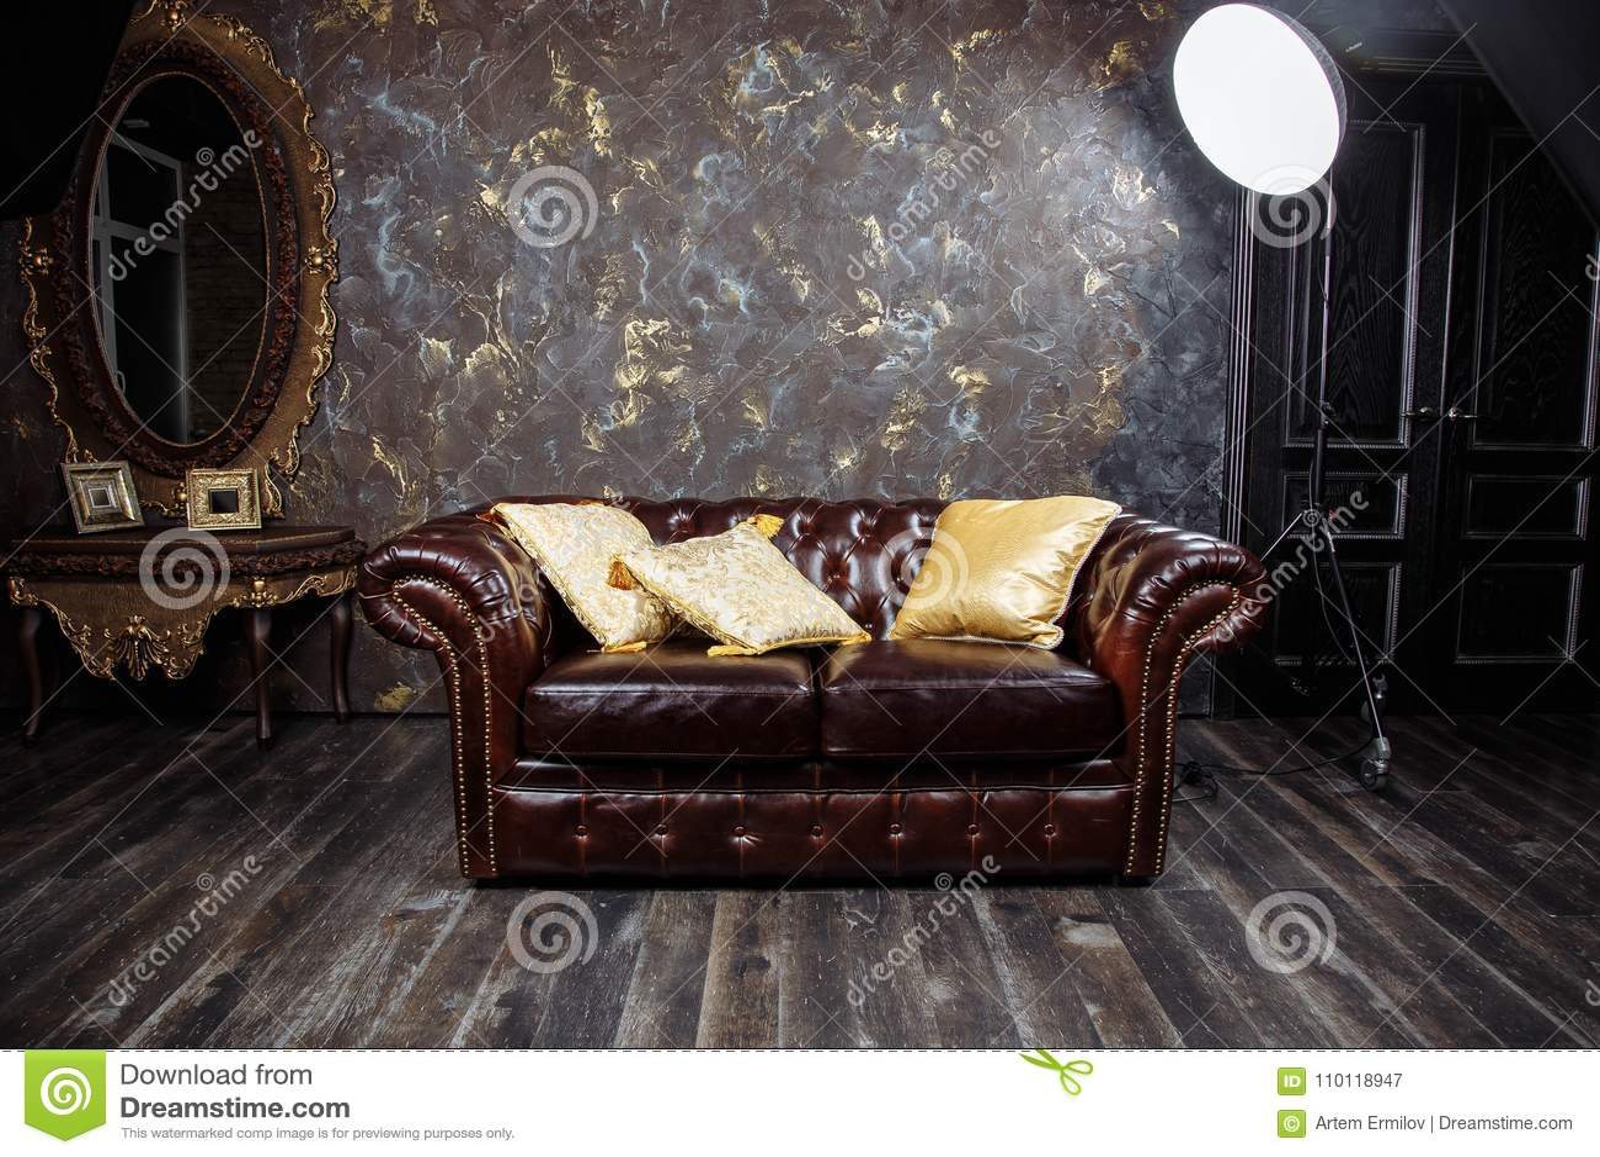 Dark Brown Vintage Beautiful Luxurious Sofa Interior With ...